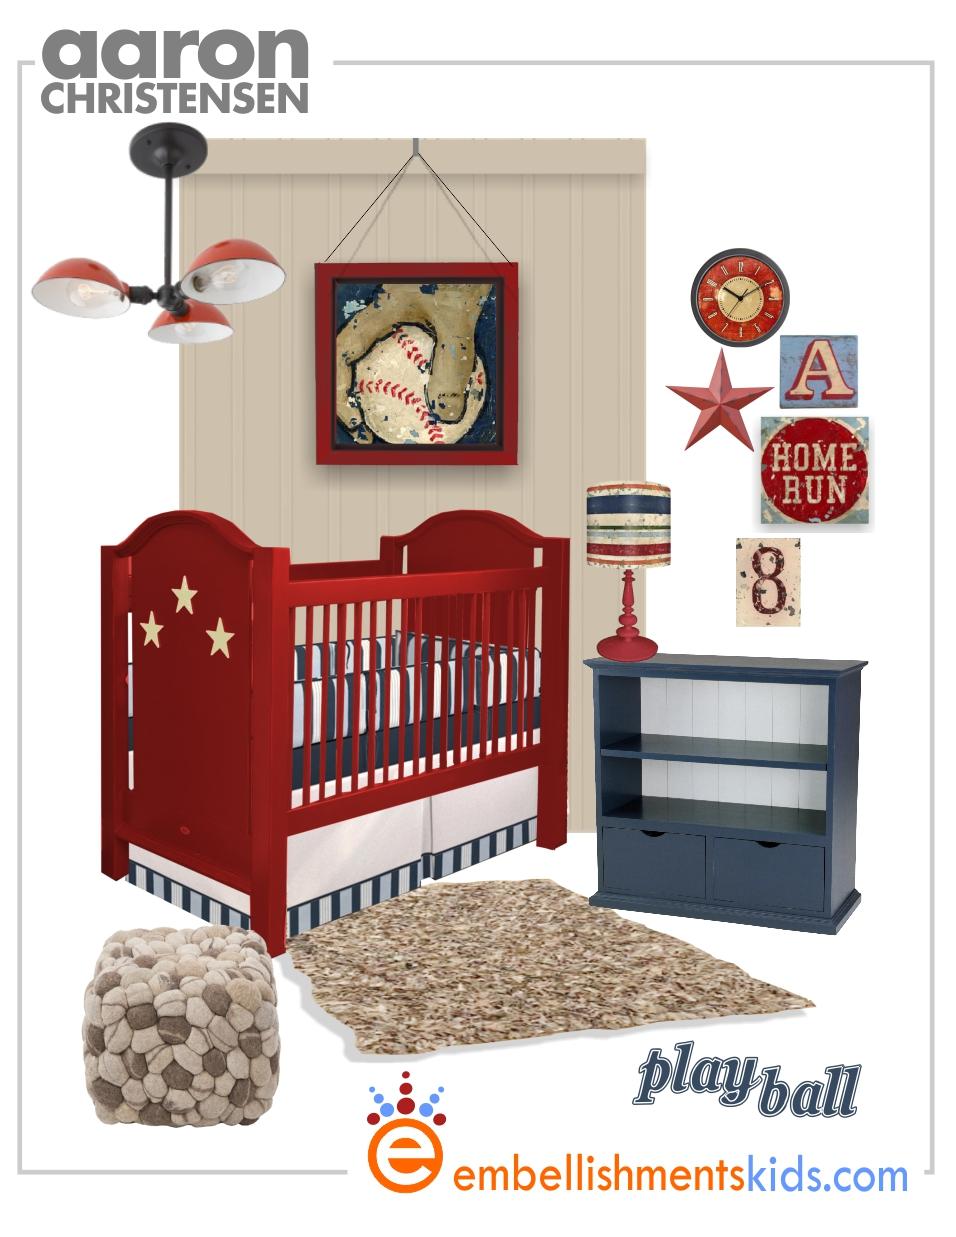 Embellishments Kids Boys Rooms And Nursery Ideas 15